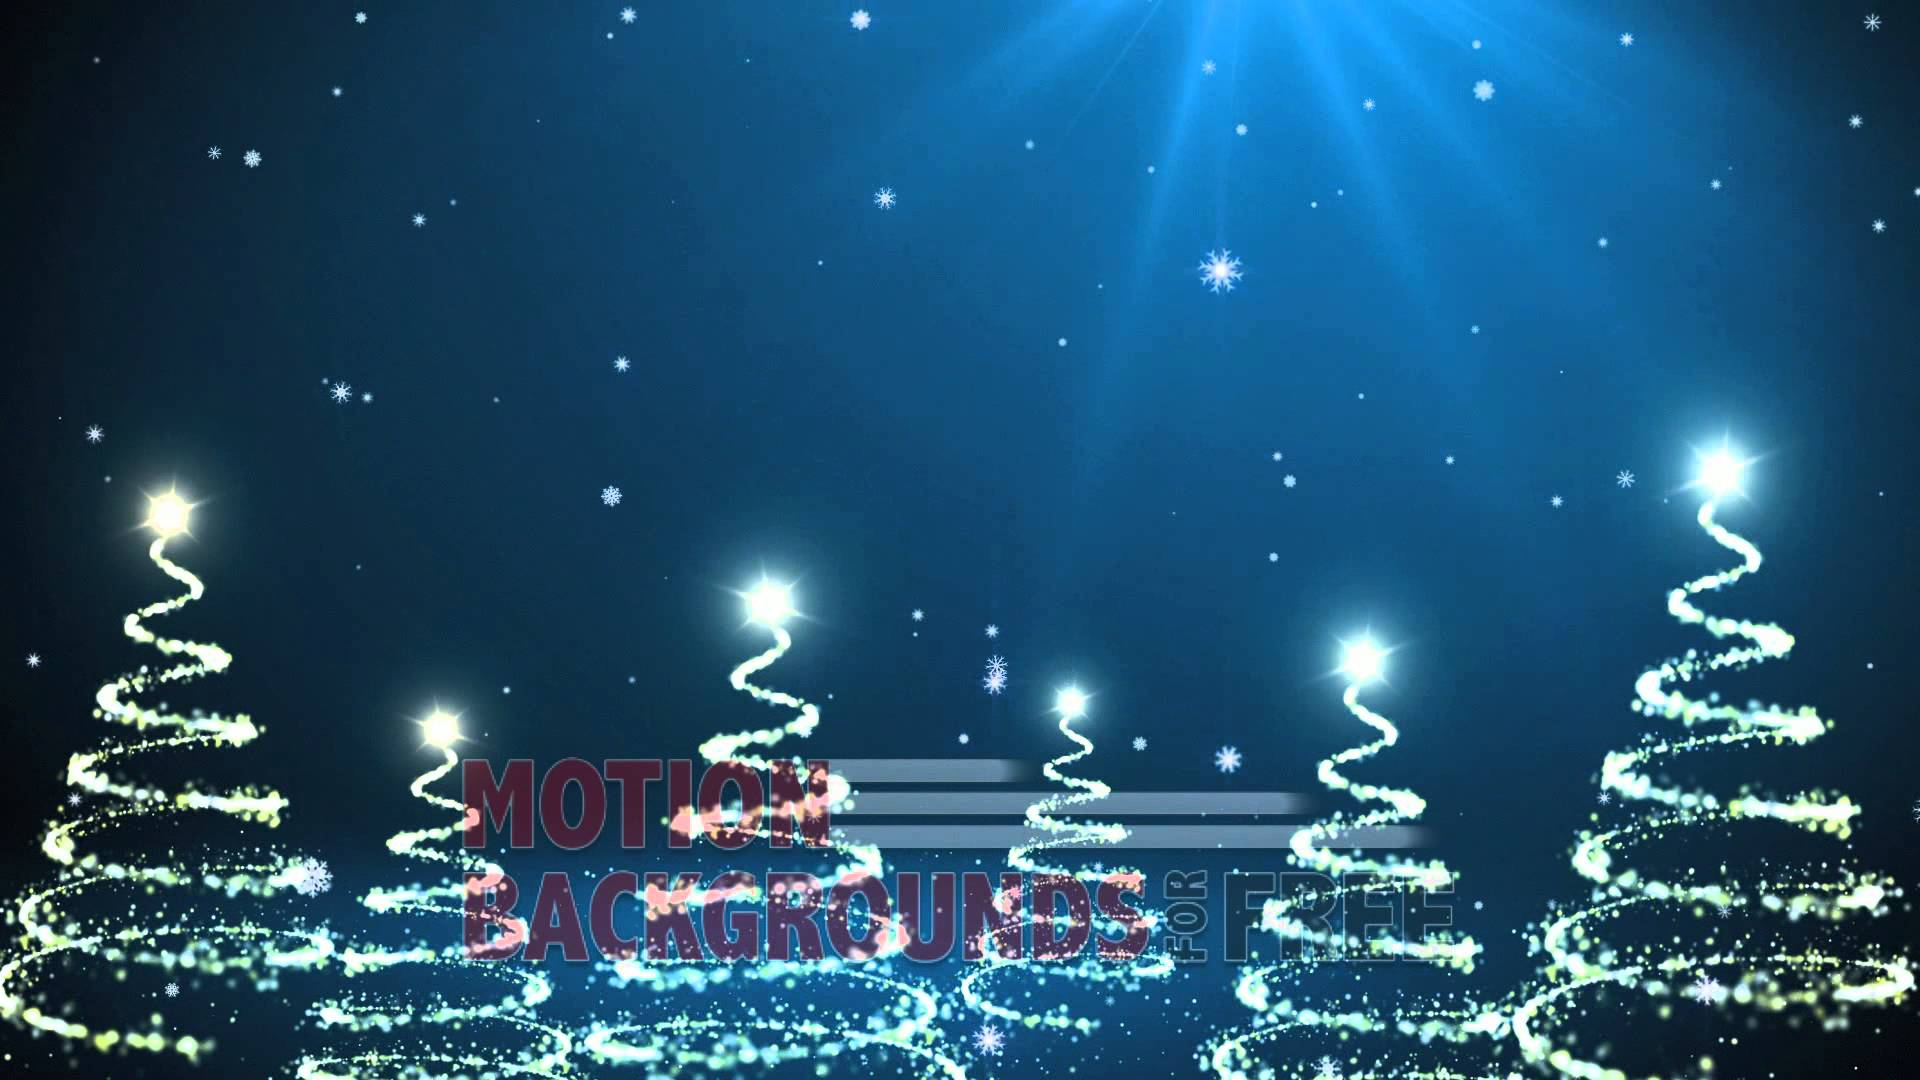 free holiday background images